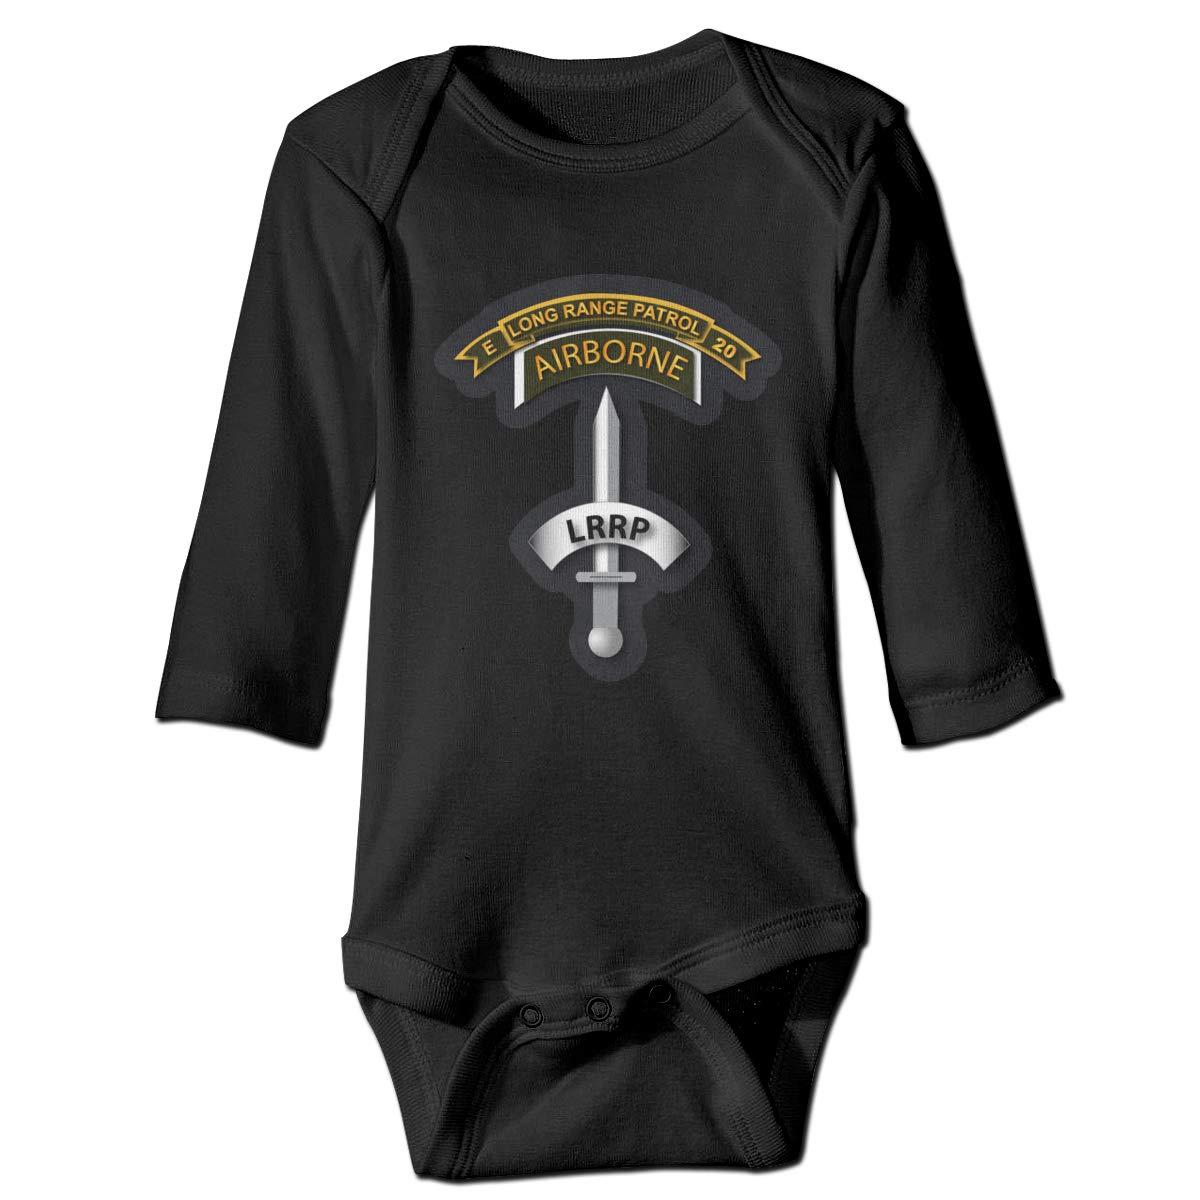 Co E 20th Inf LRRP Baby Long Sleeve Bodysuits Vietnam